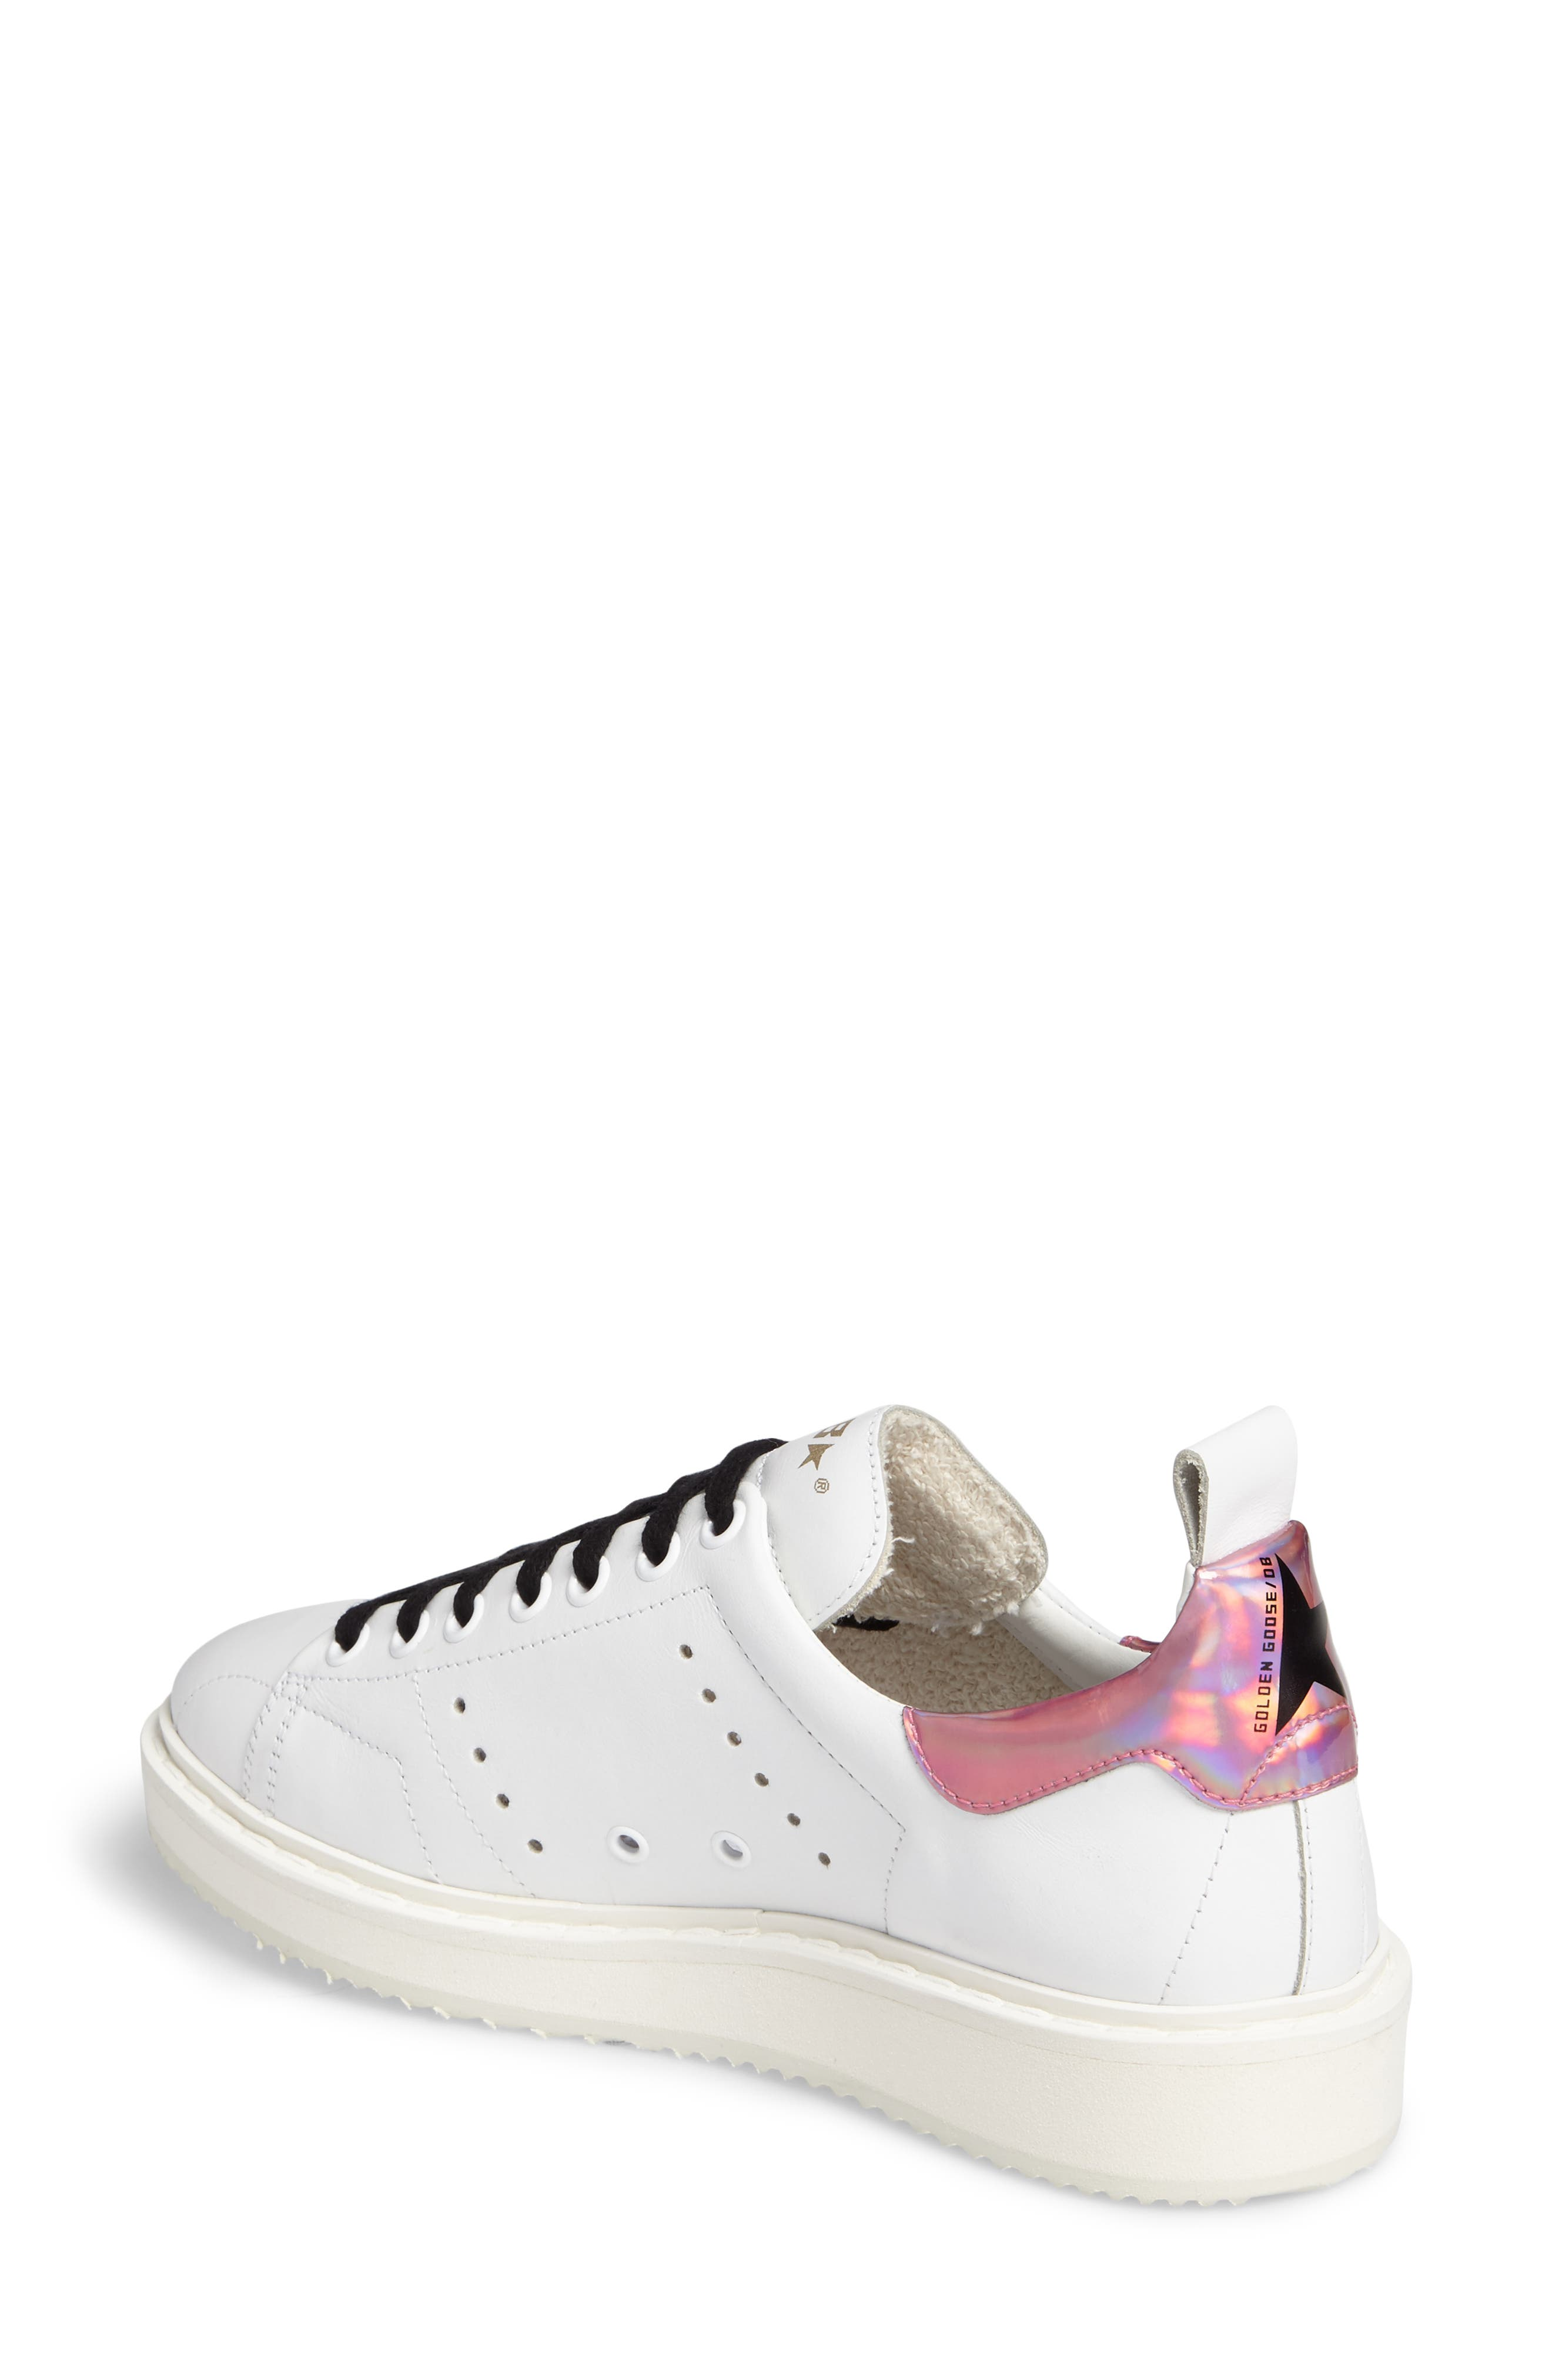 Alternate Image 2  - Golden Goose Starter Low Top Sneaker (Women)